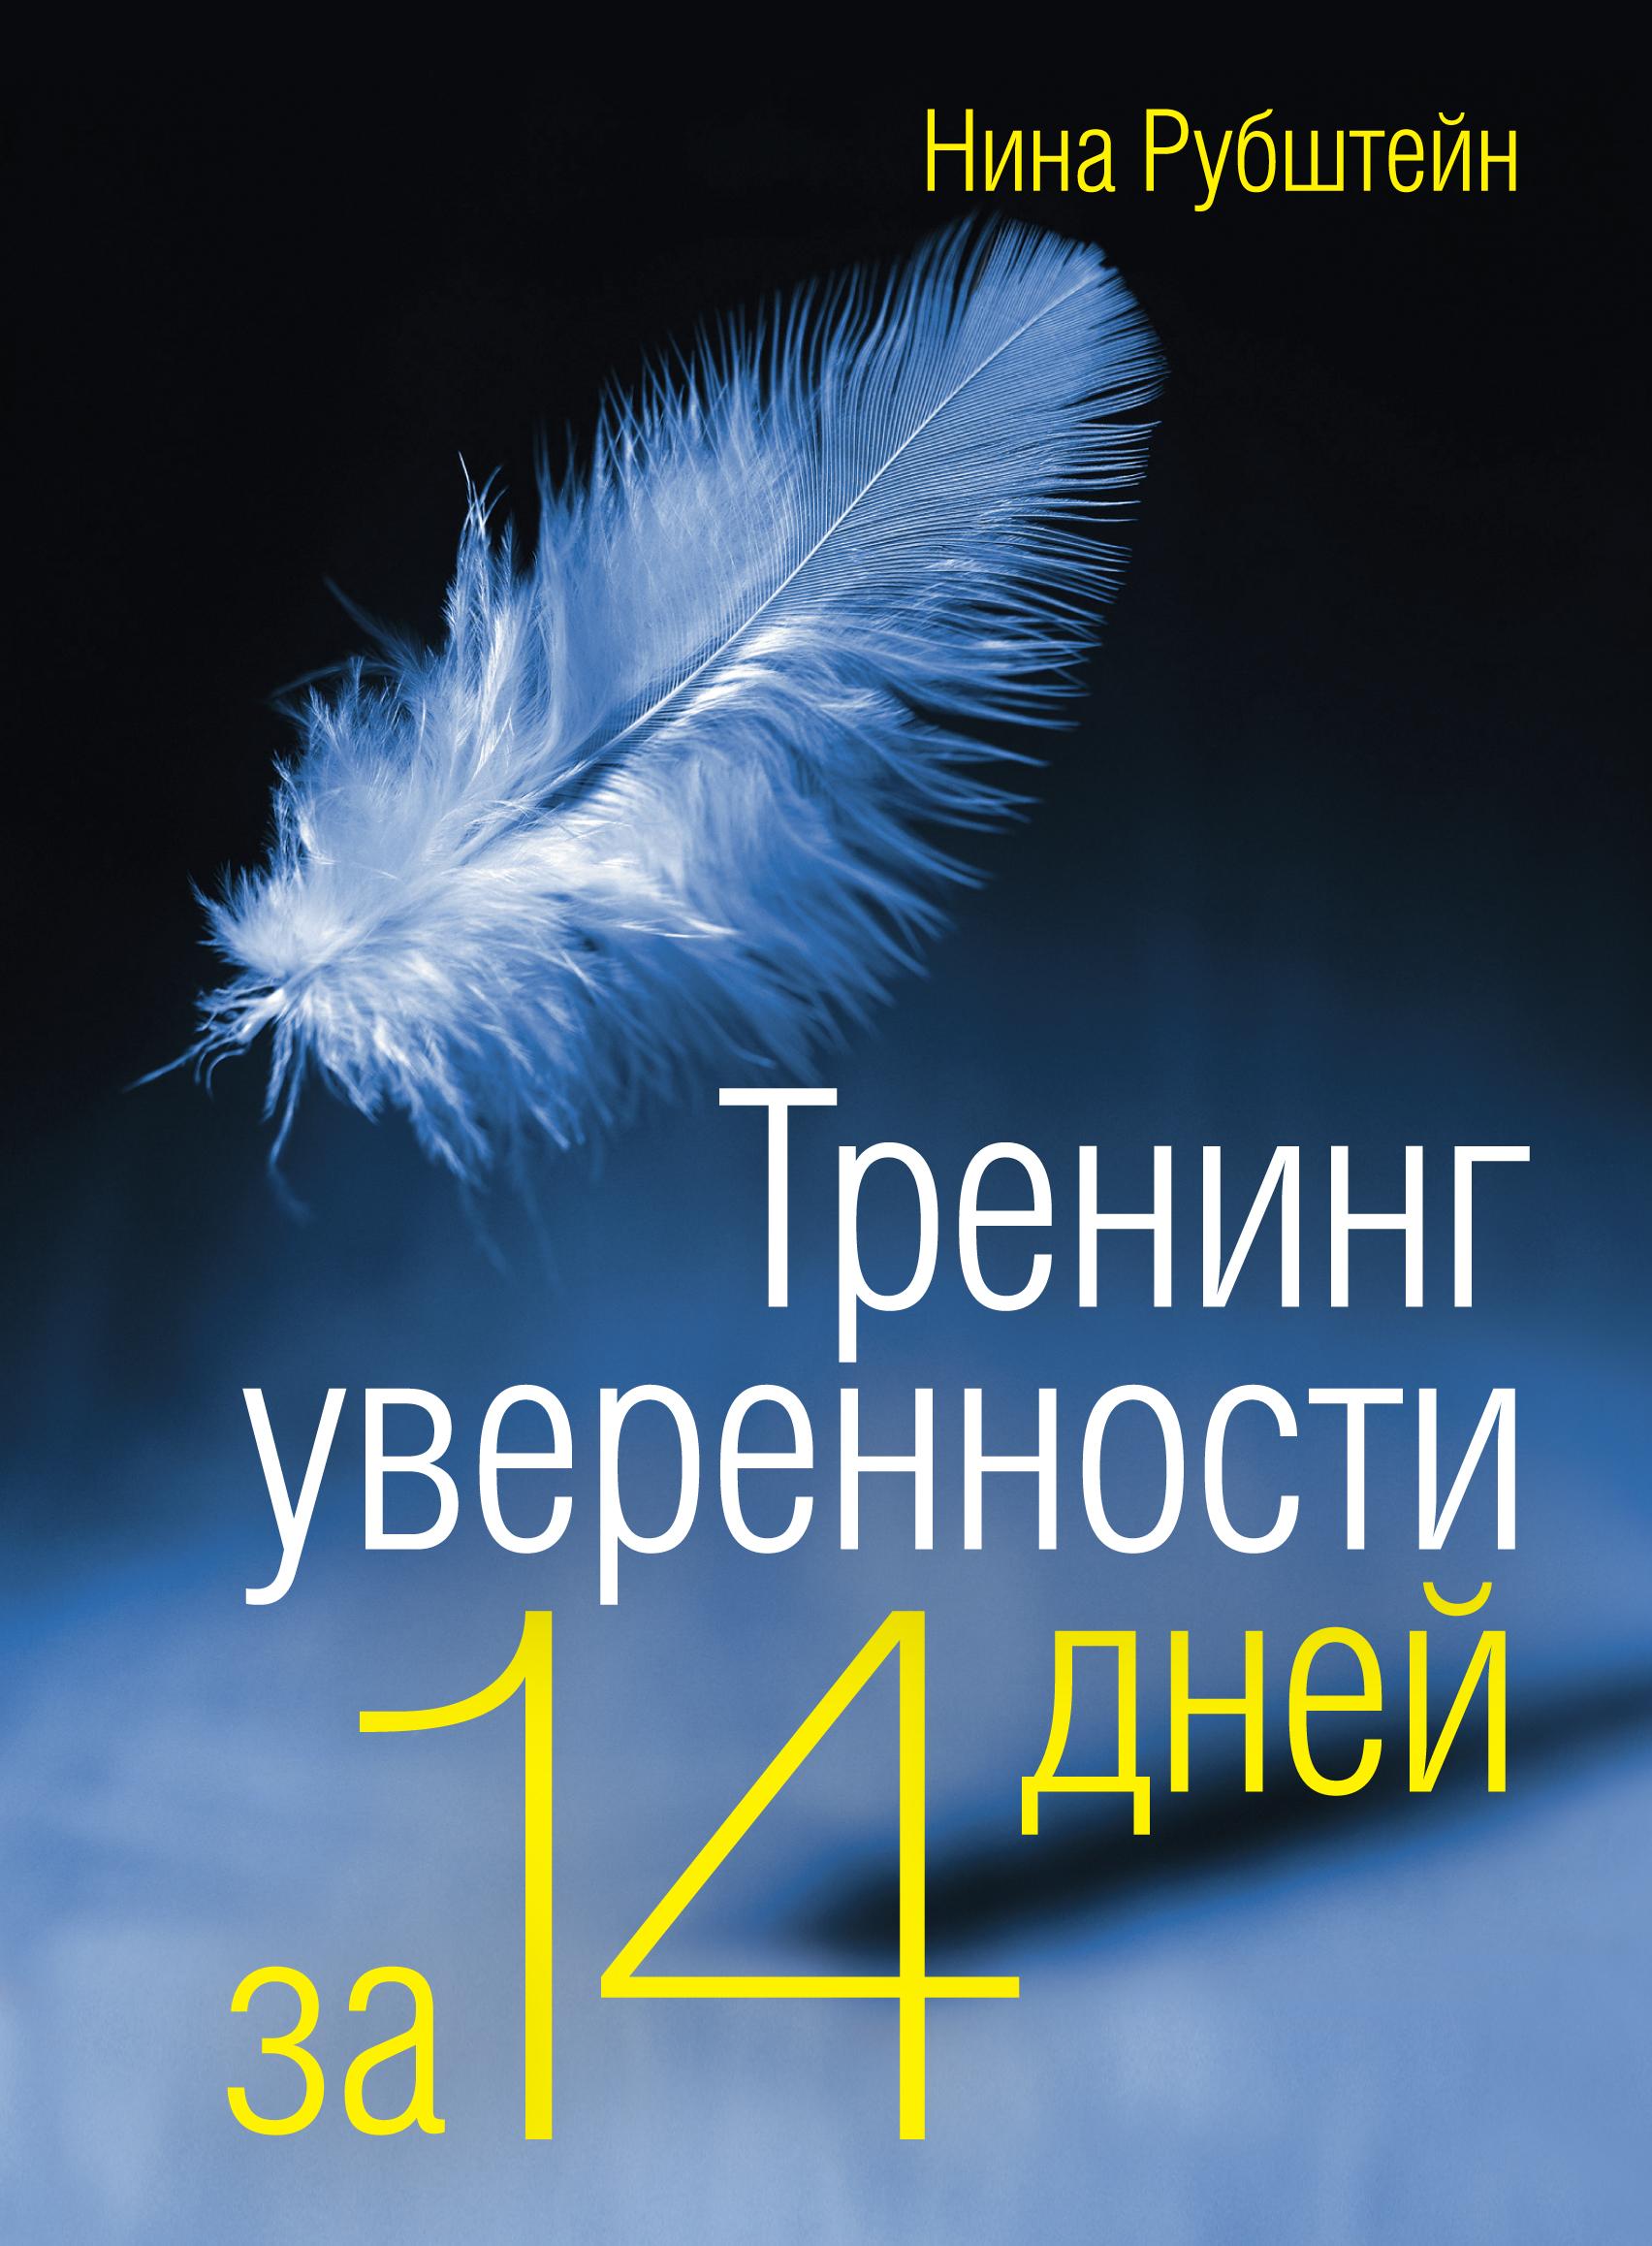 Нина Рубштейн Тренинг уверенности за 14 дней